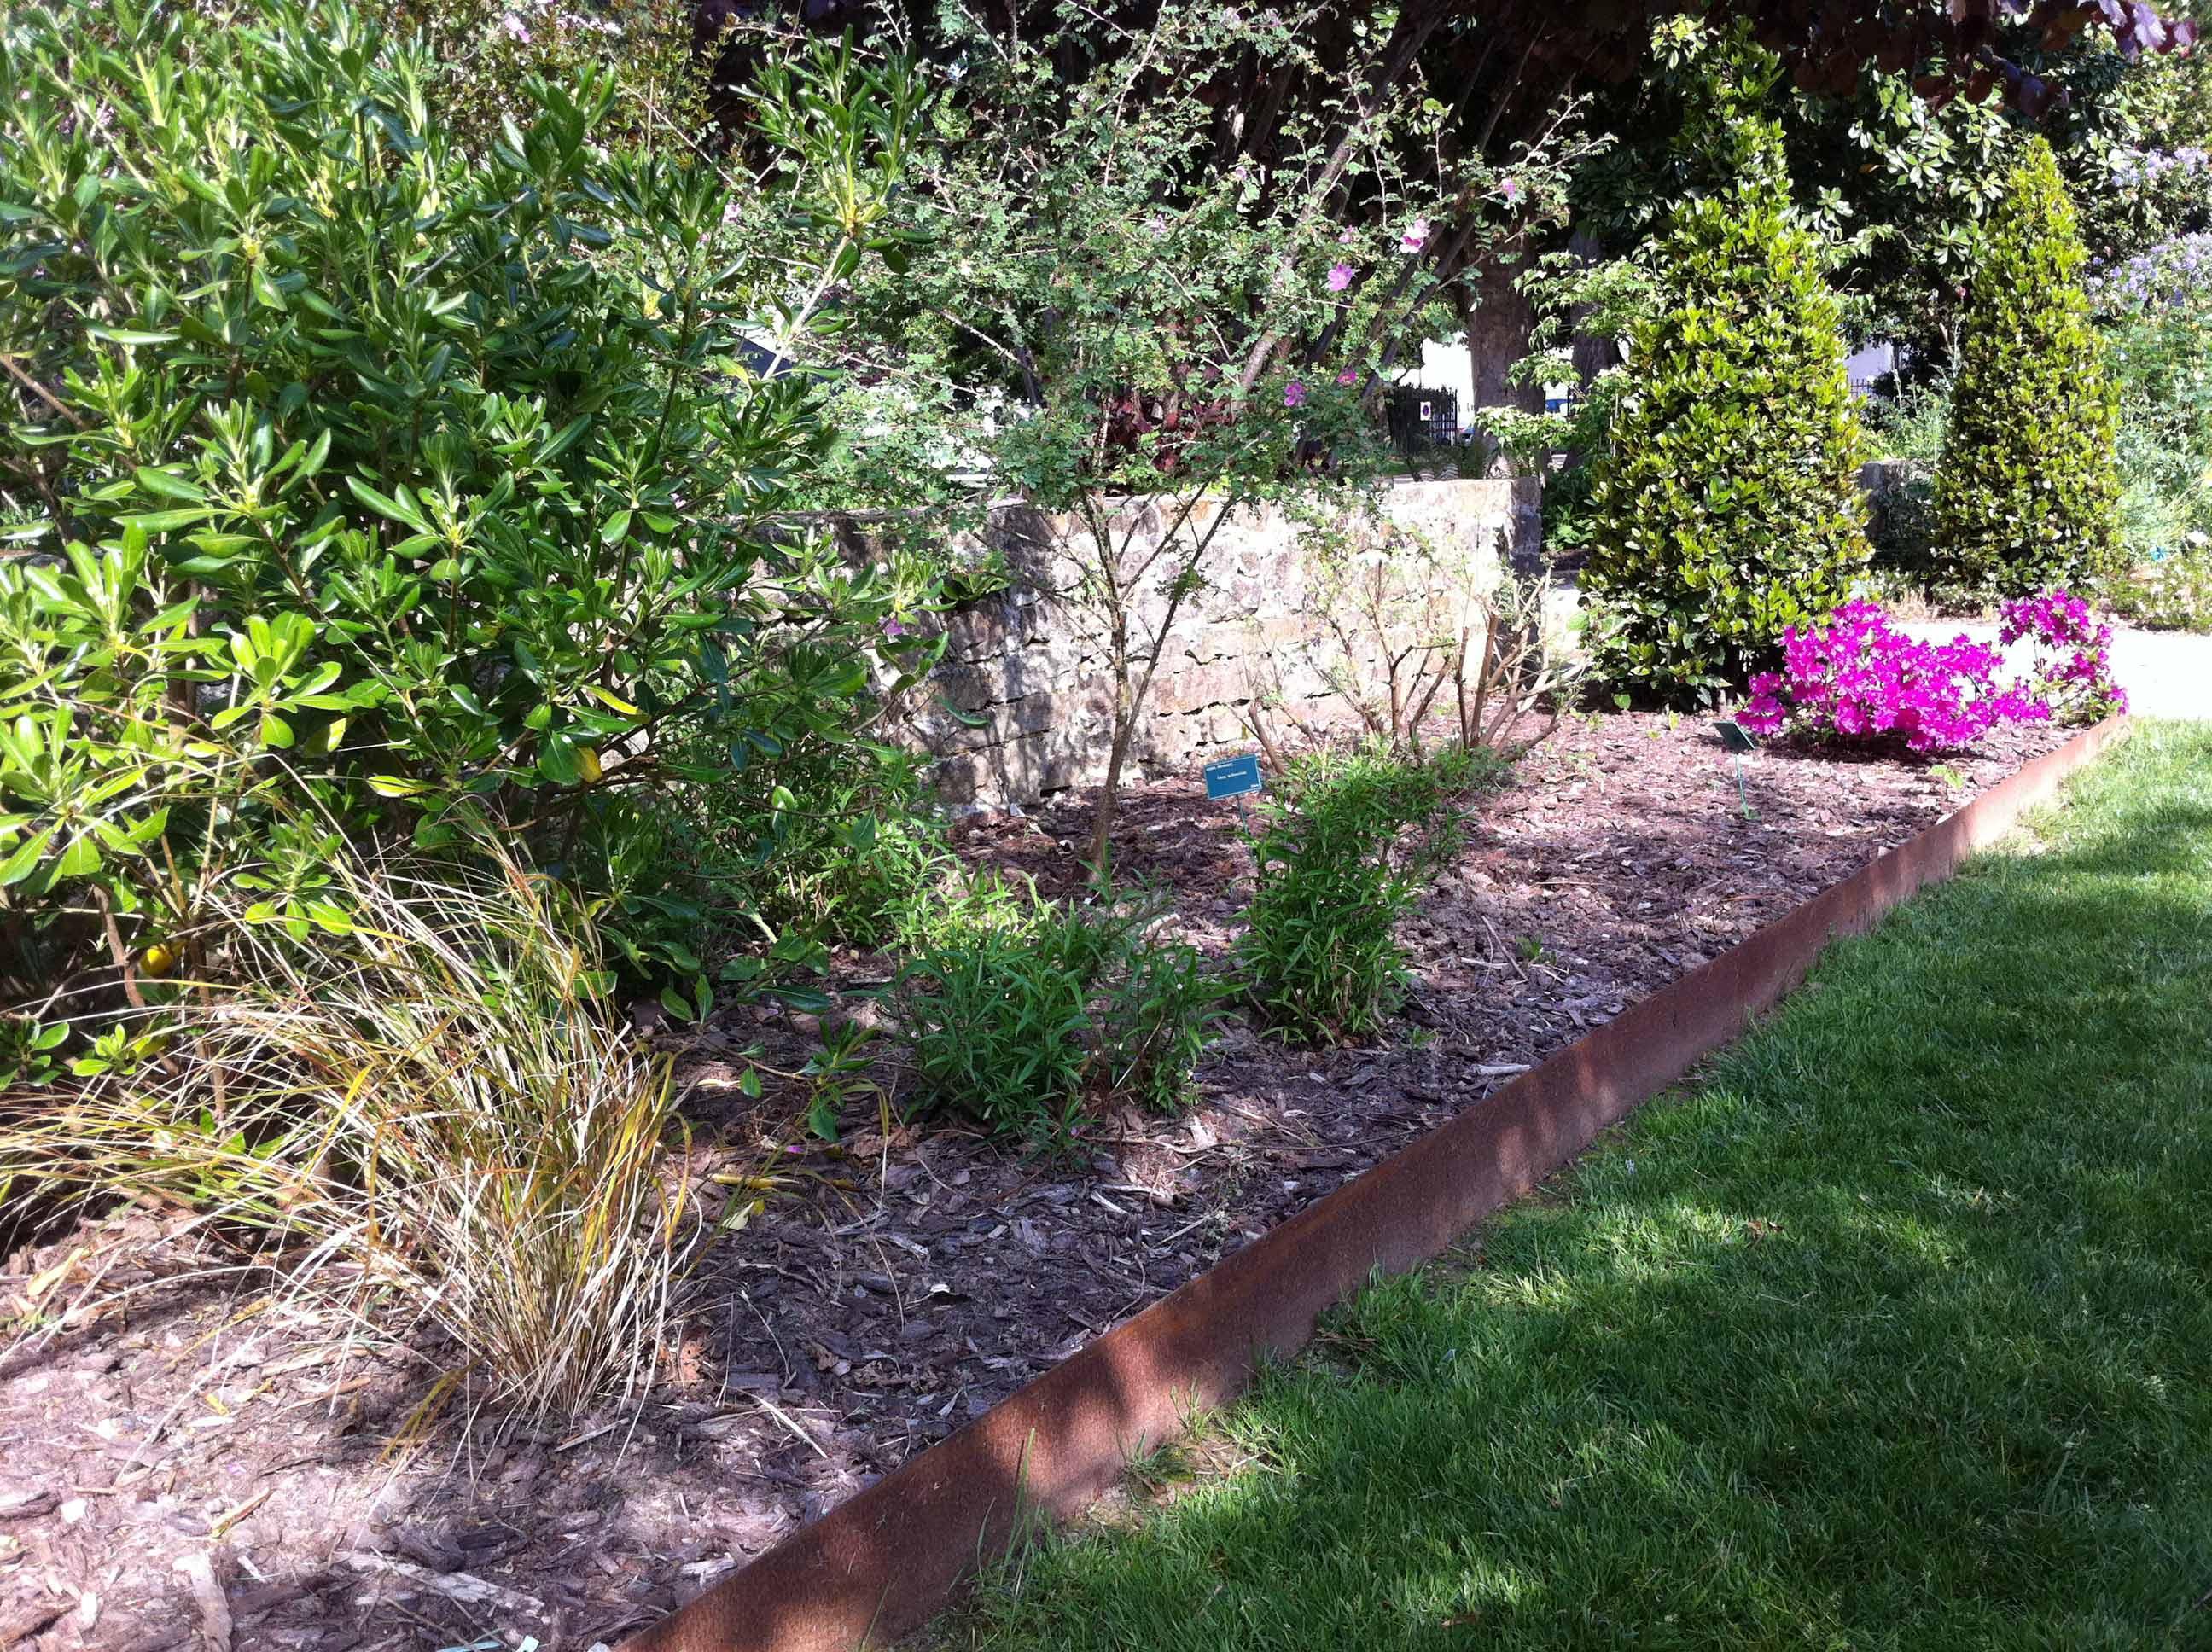 à quoi sert une bordure de jardin ?